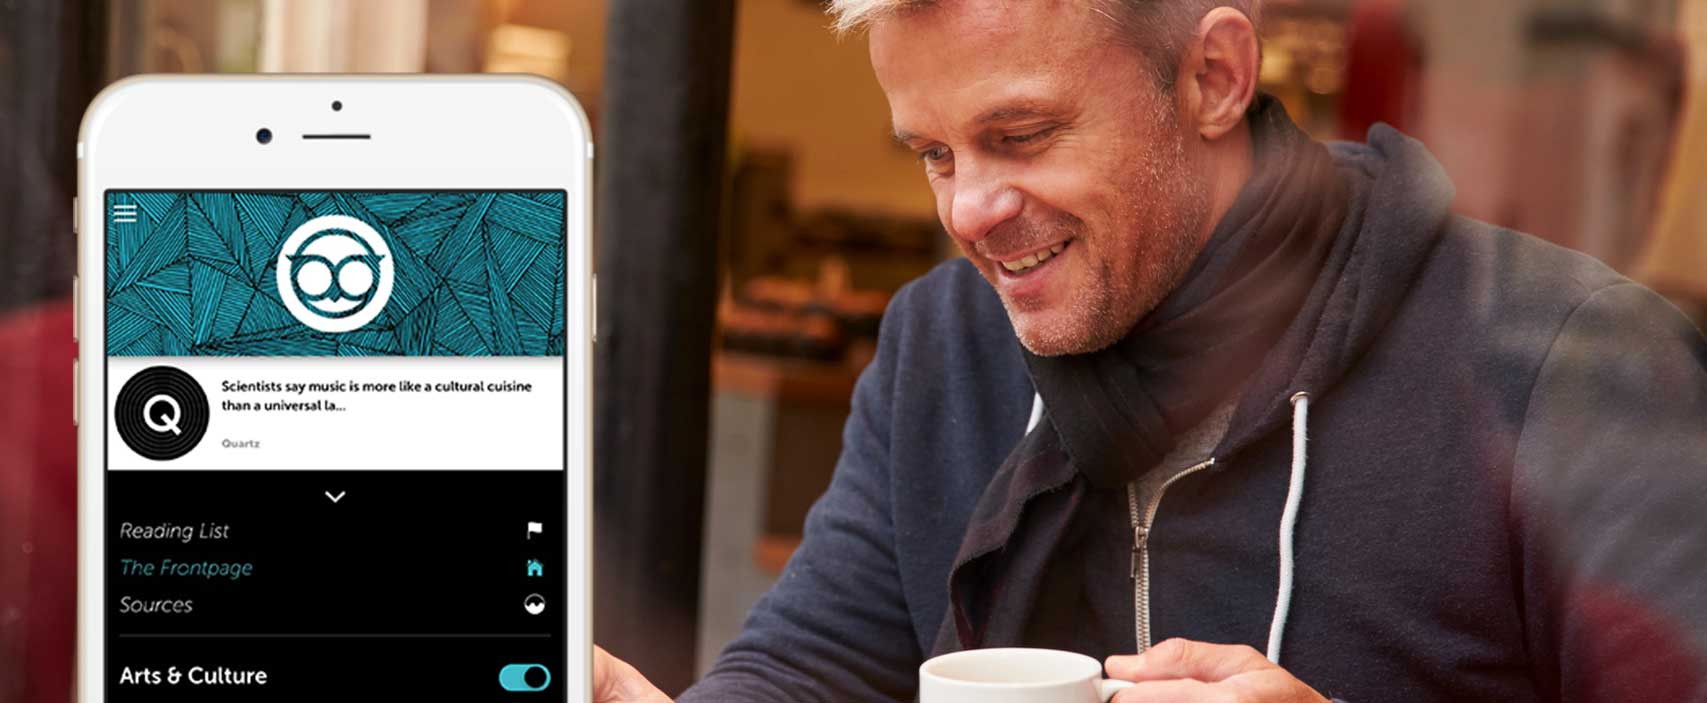 Why Small Business Love Ebbu App